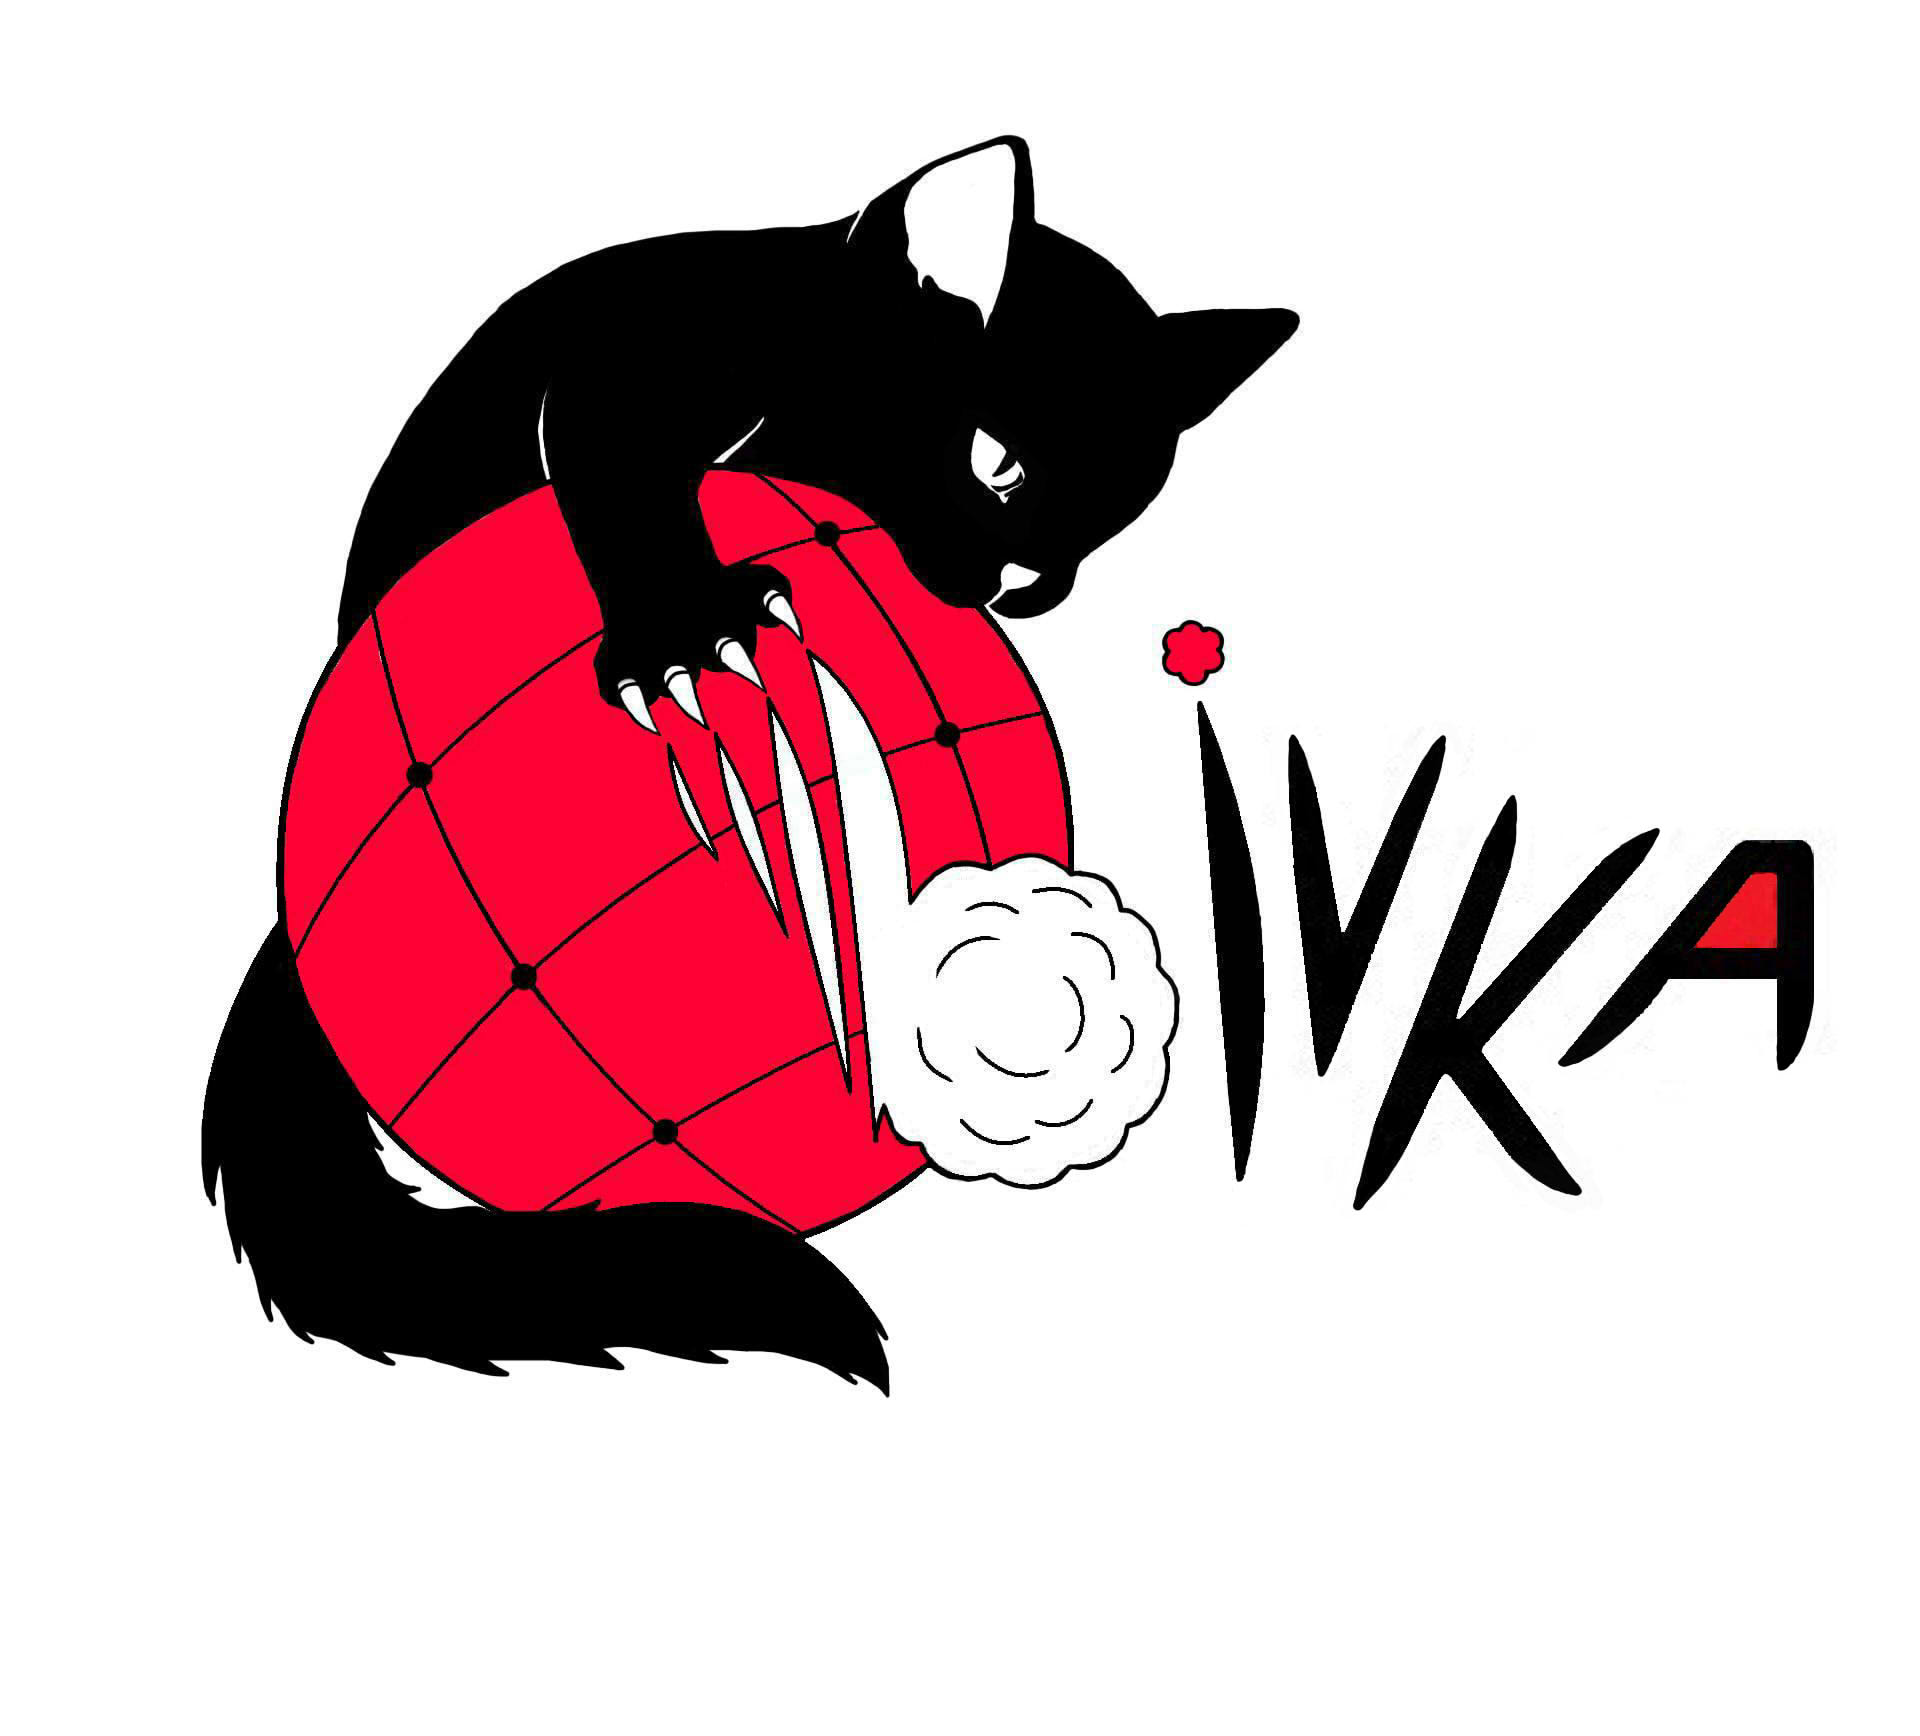 Логотип для сайта OBIVKA.RU фото f_5165c1a29c1453db.jpg